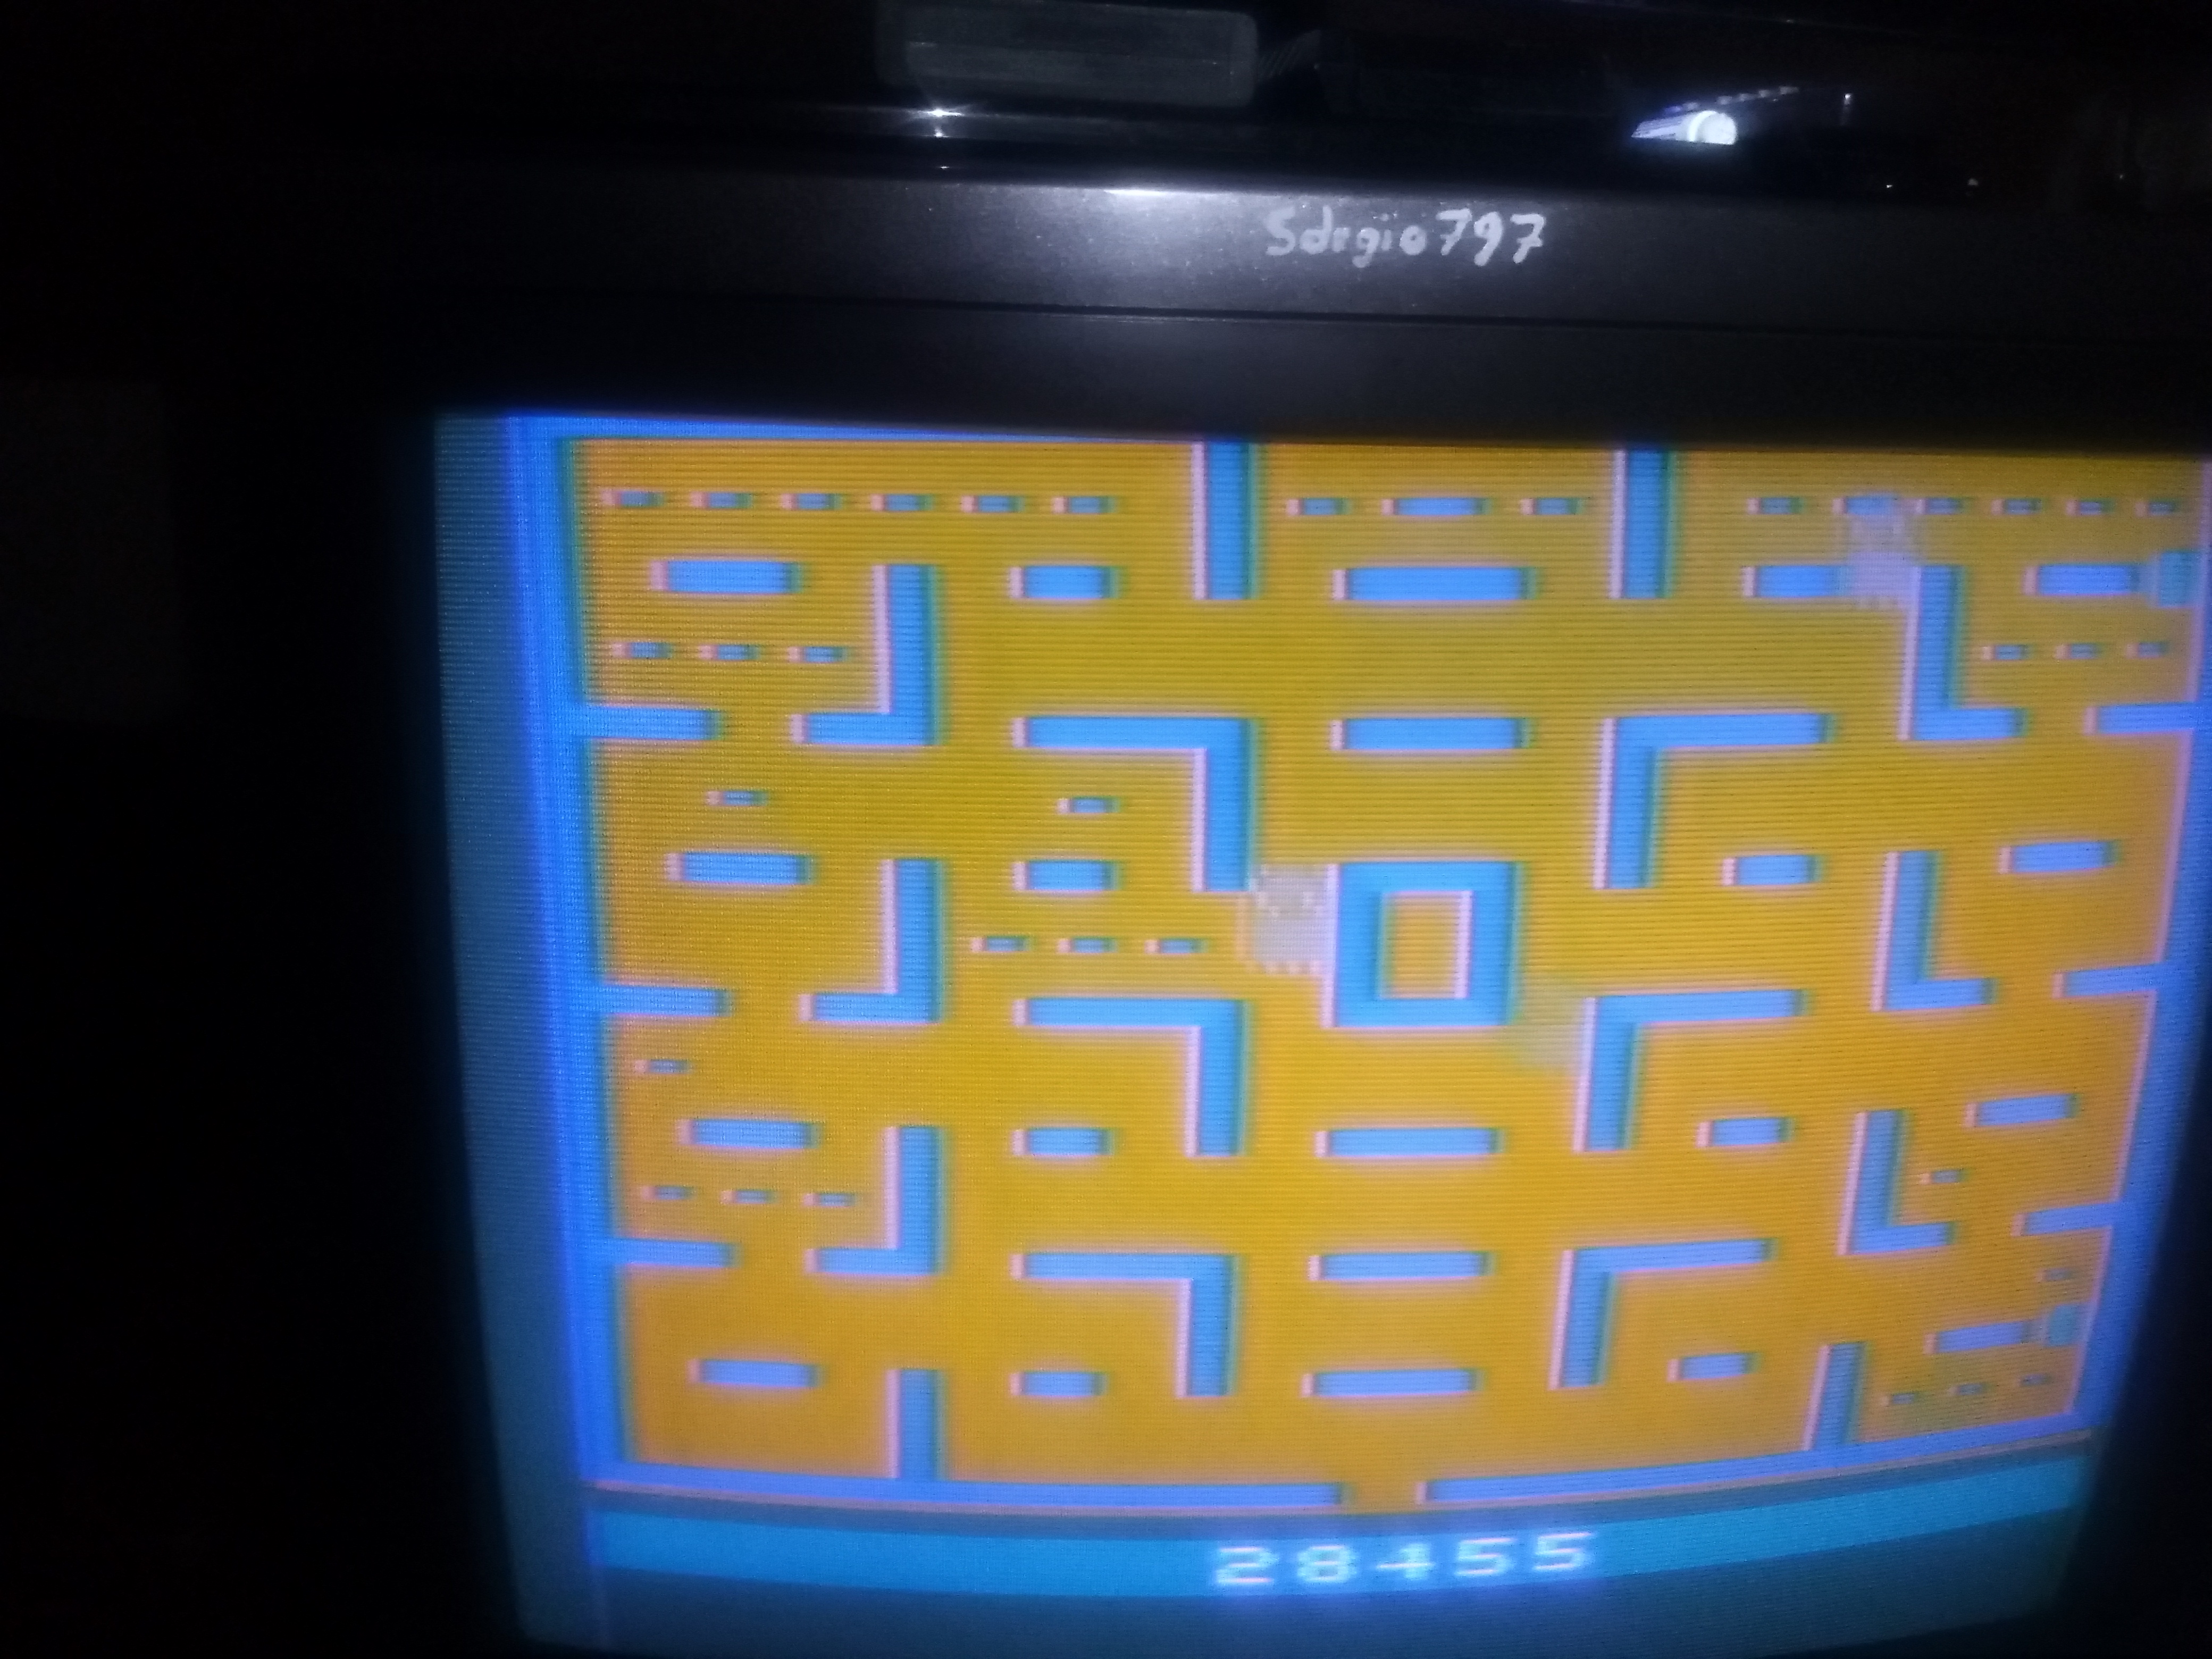 Sdrgio797: Pac-Man: Game 6 (Atari 2600 Novice/B) 28,455 points on 2020-07-02 11:49:24